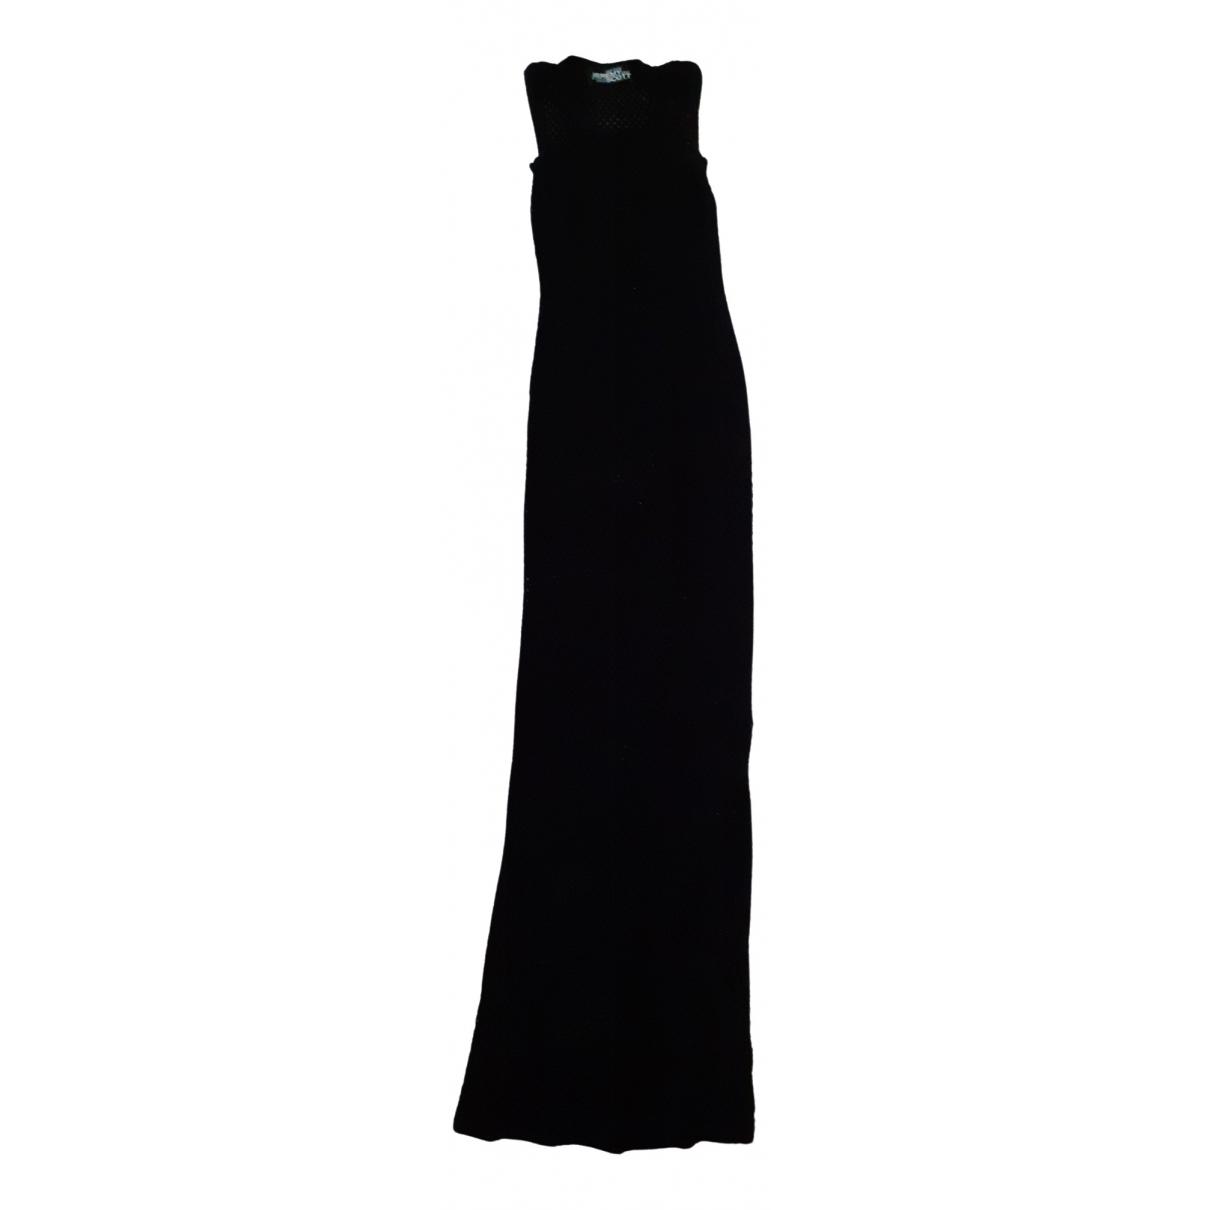 Jeremy Scott \N Black Cotton dress for Women S International